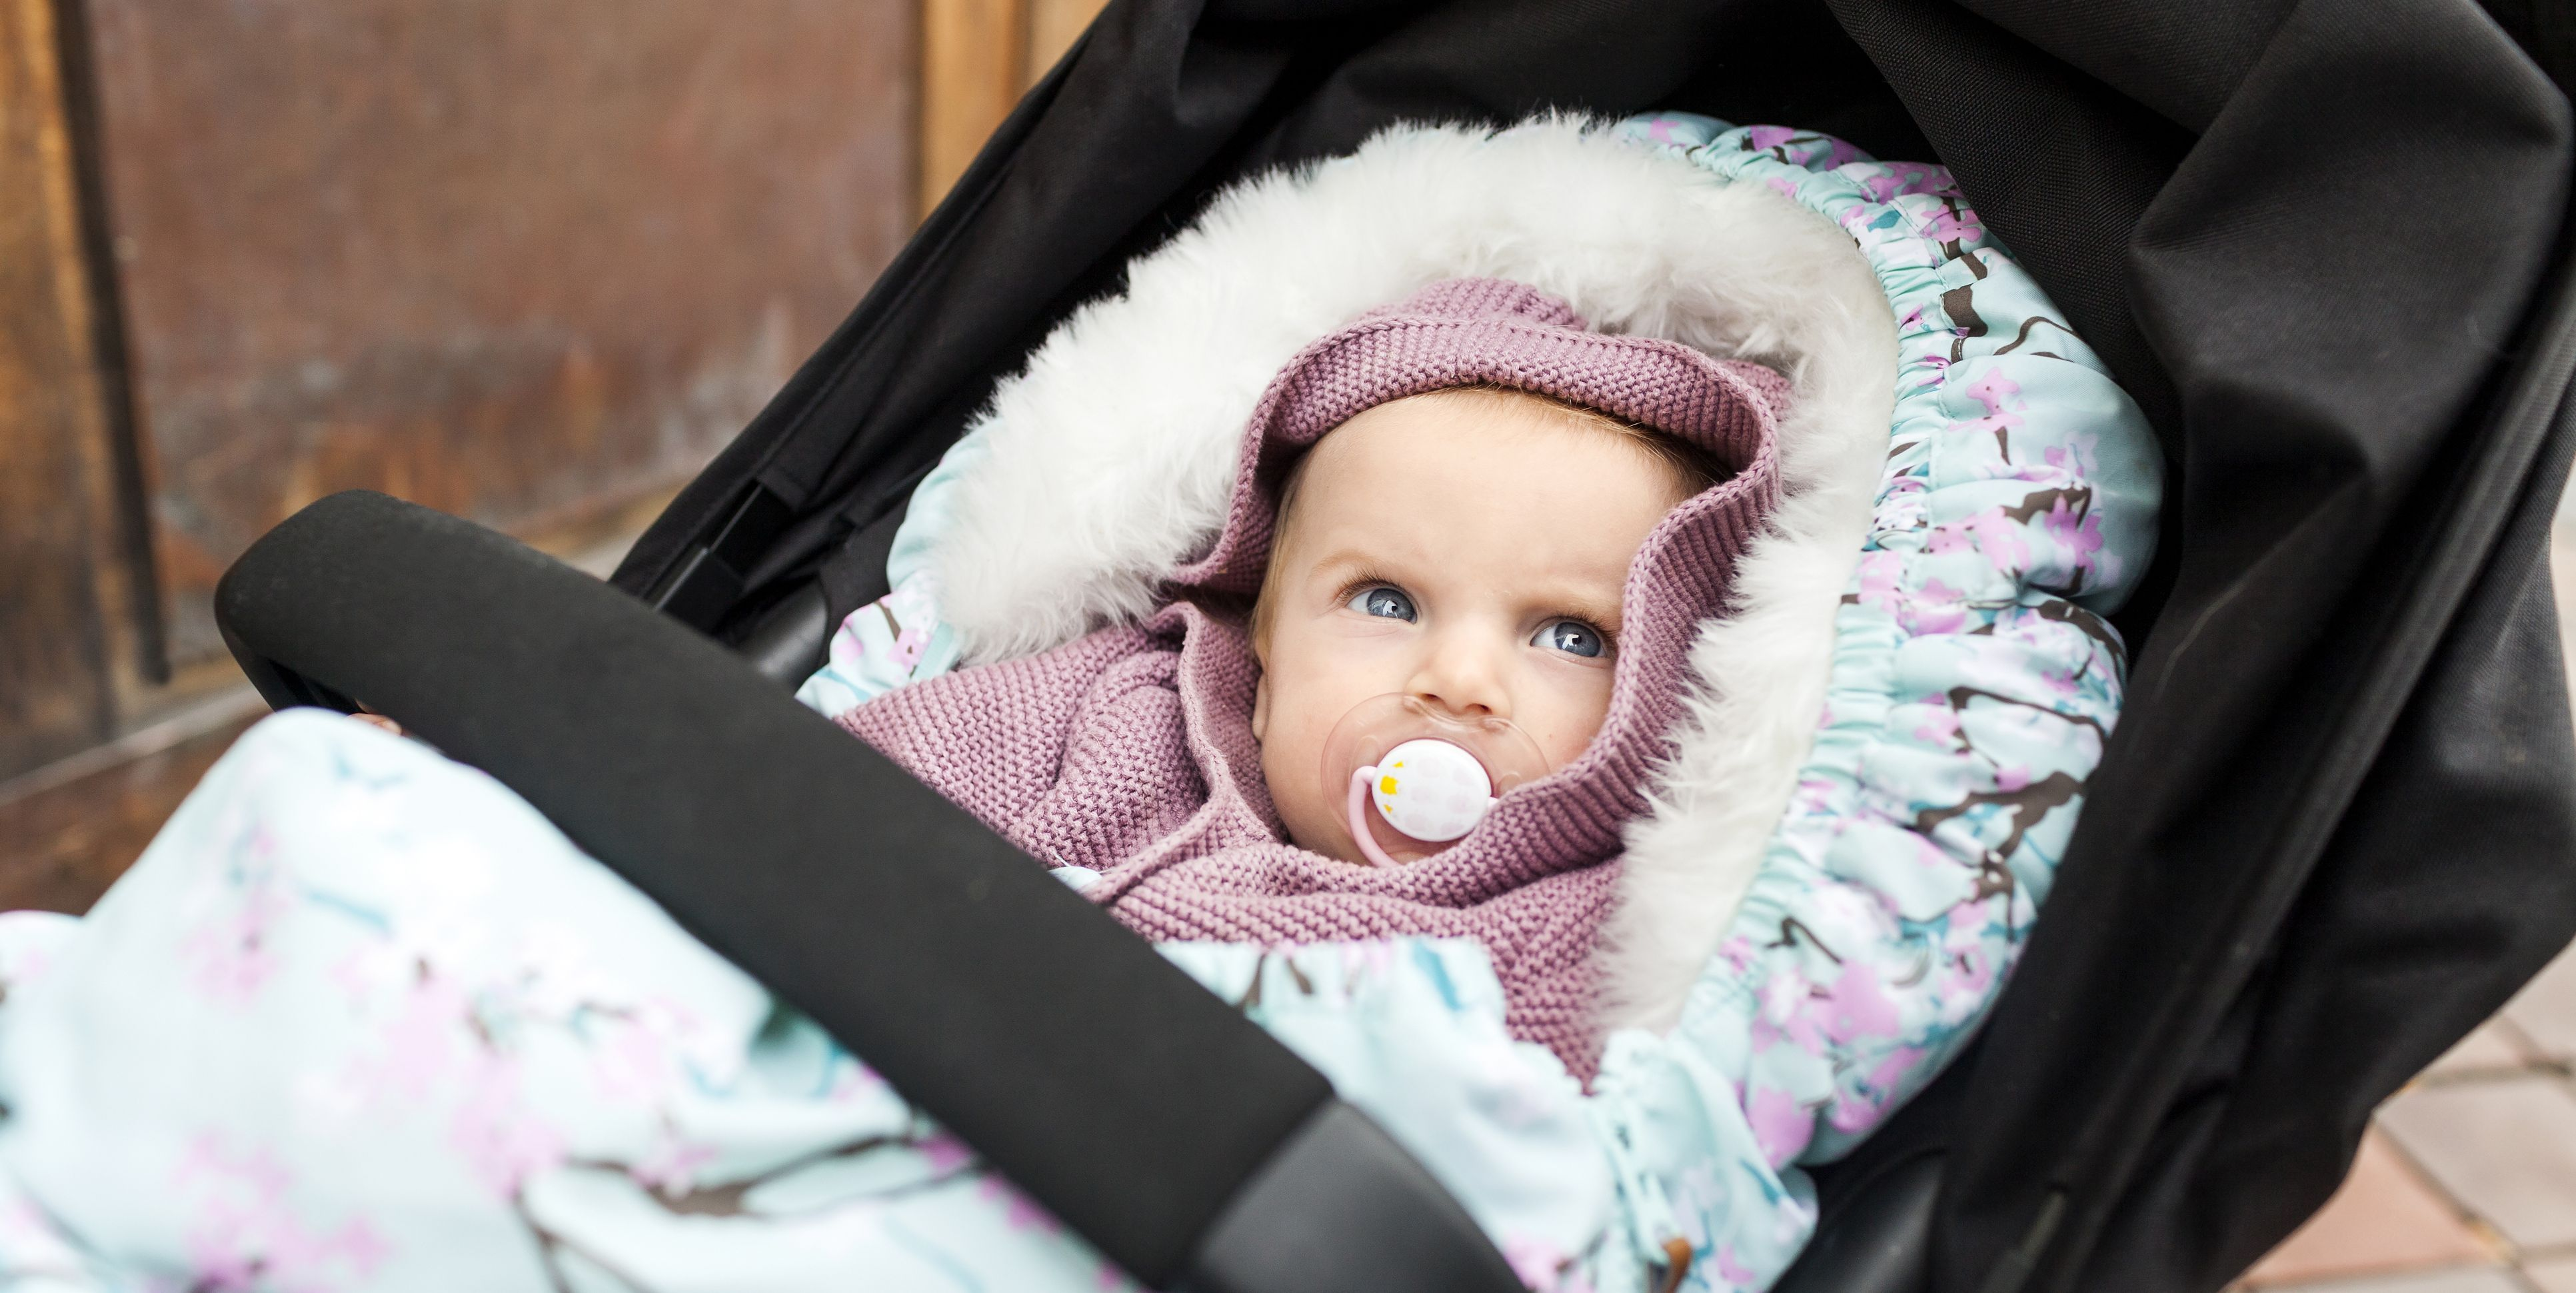 saco cubrepiernas carrito de bebé